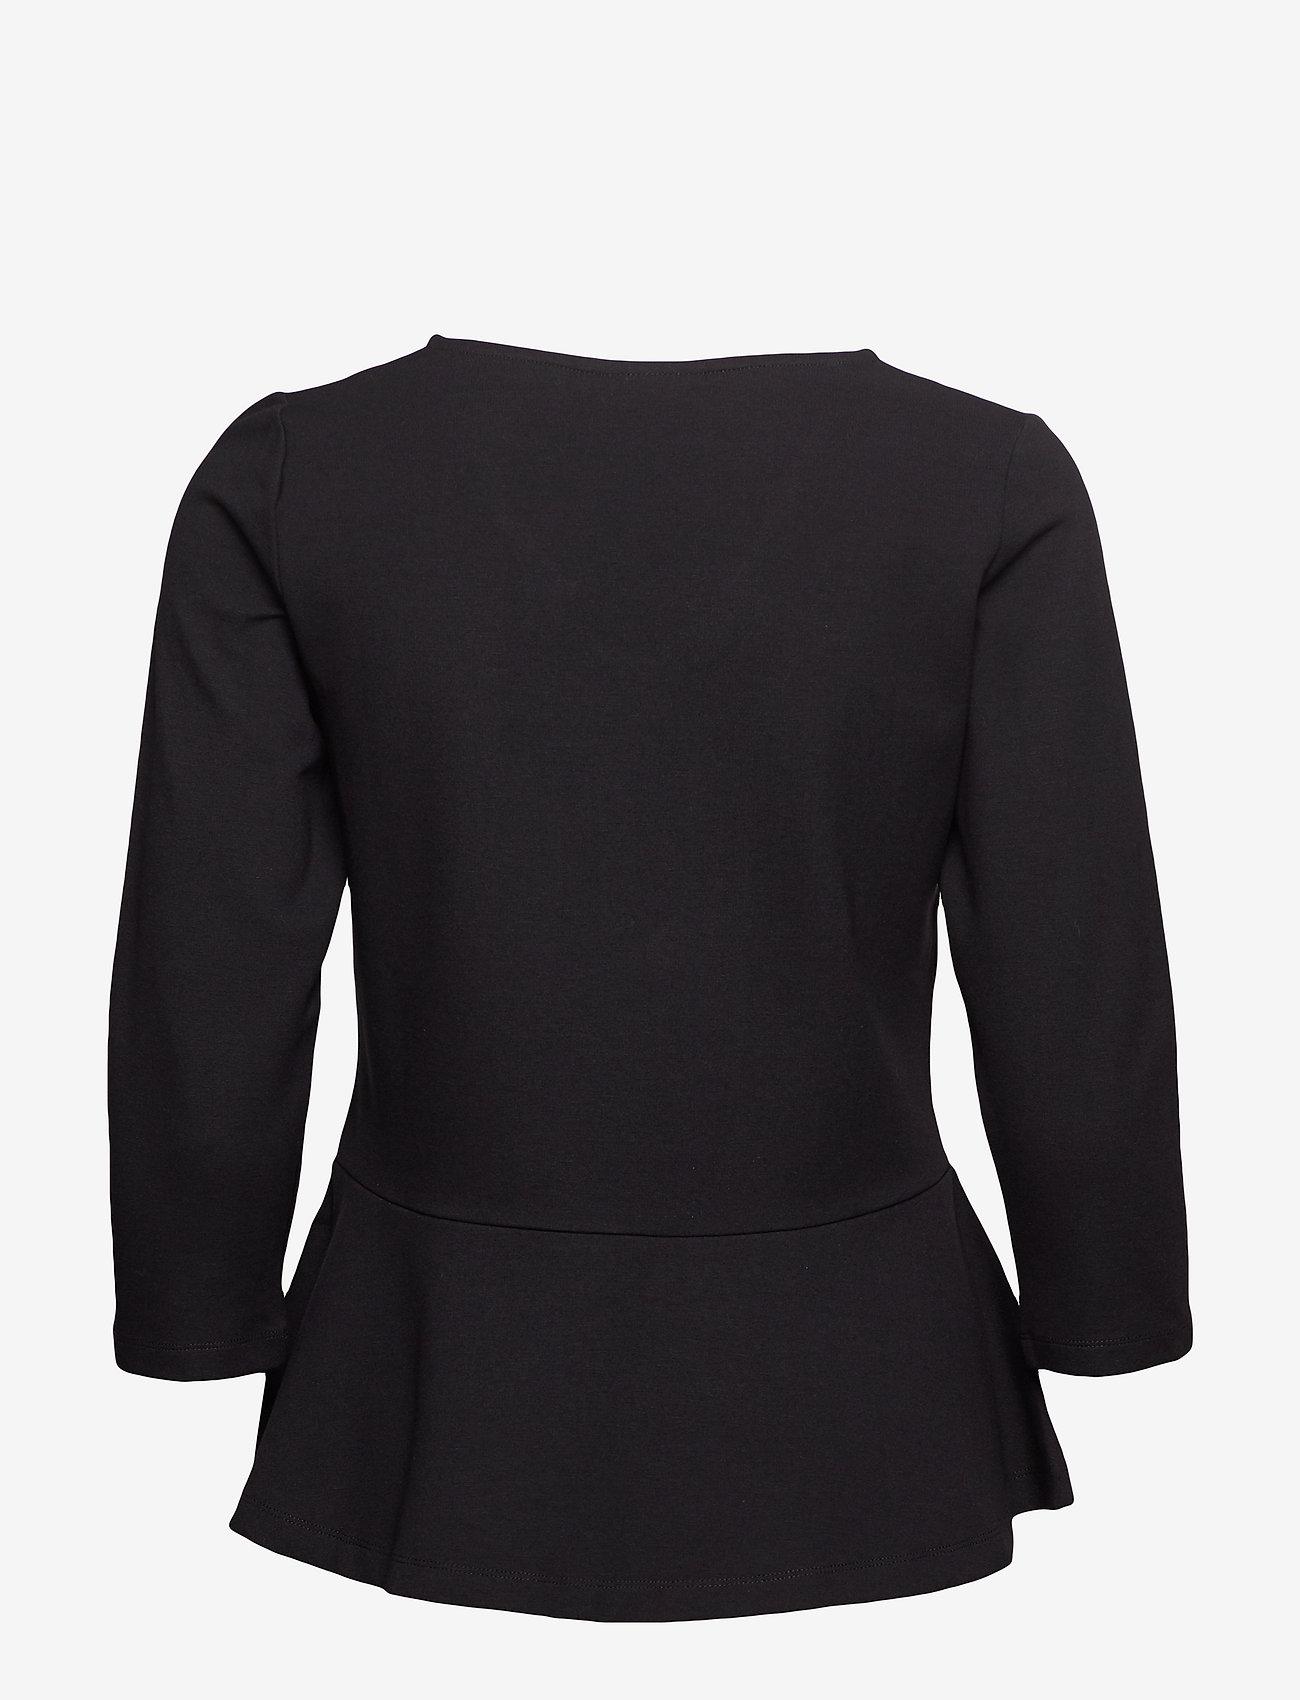 Masai - Betty top - long sleeved blouses - black - 1